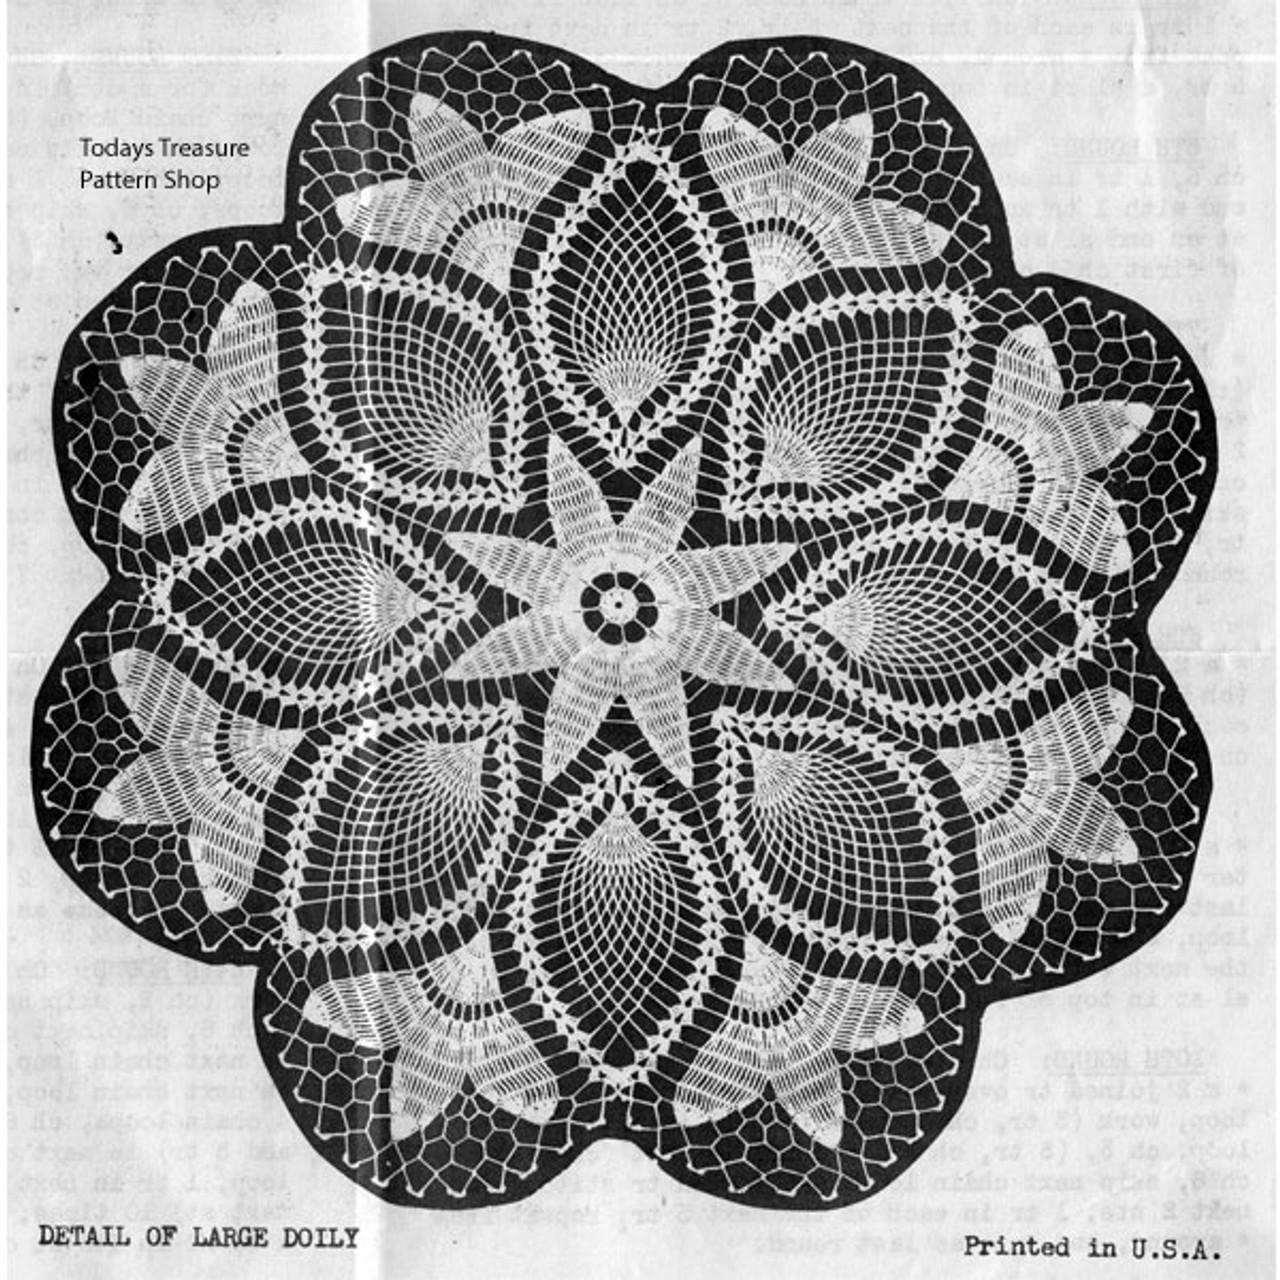 Vintage Tulip Crochet Doily Pattern in Pineapples